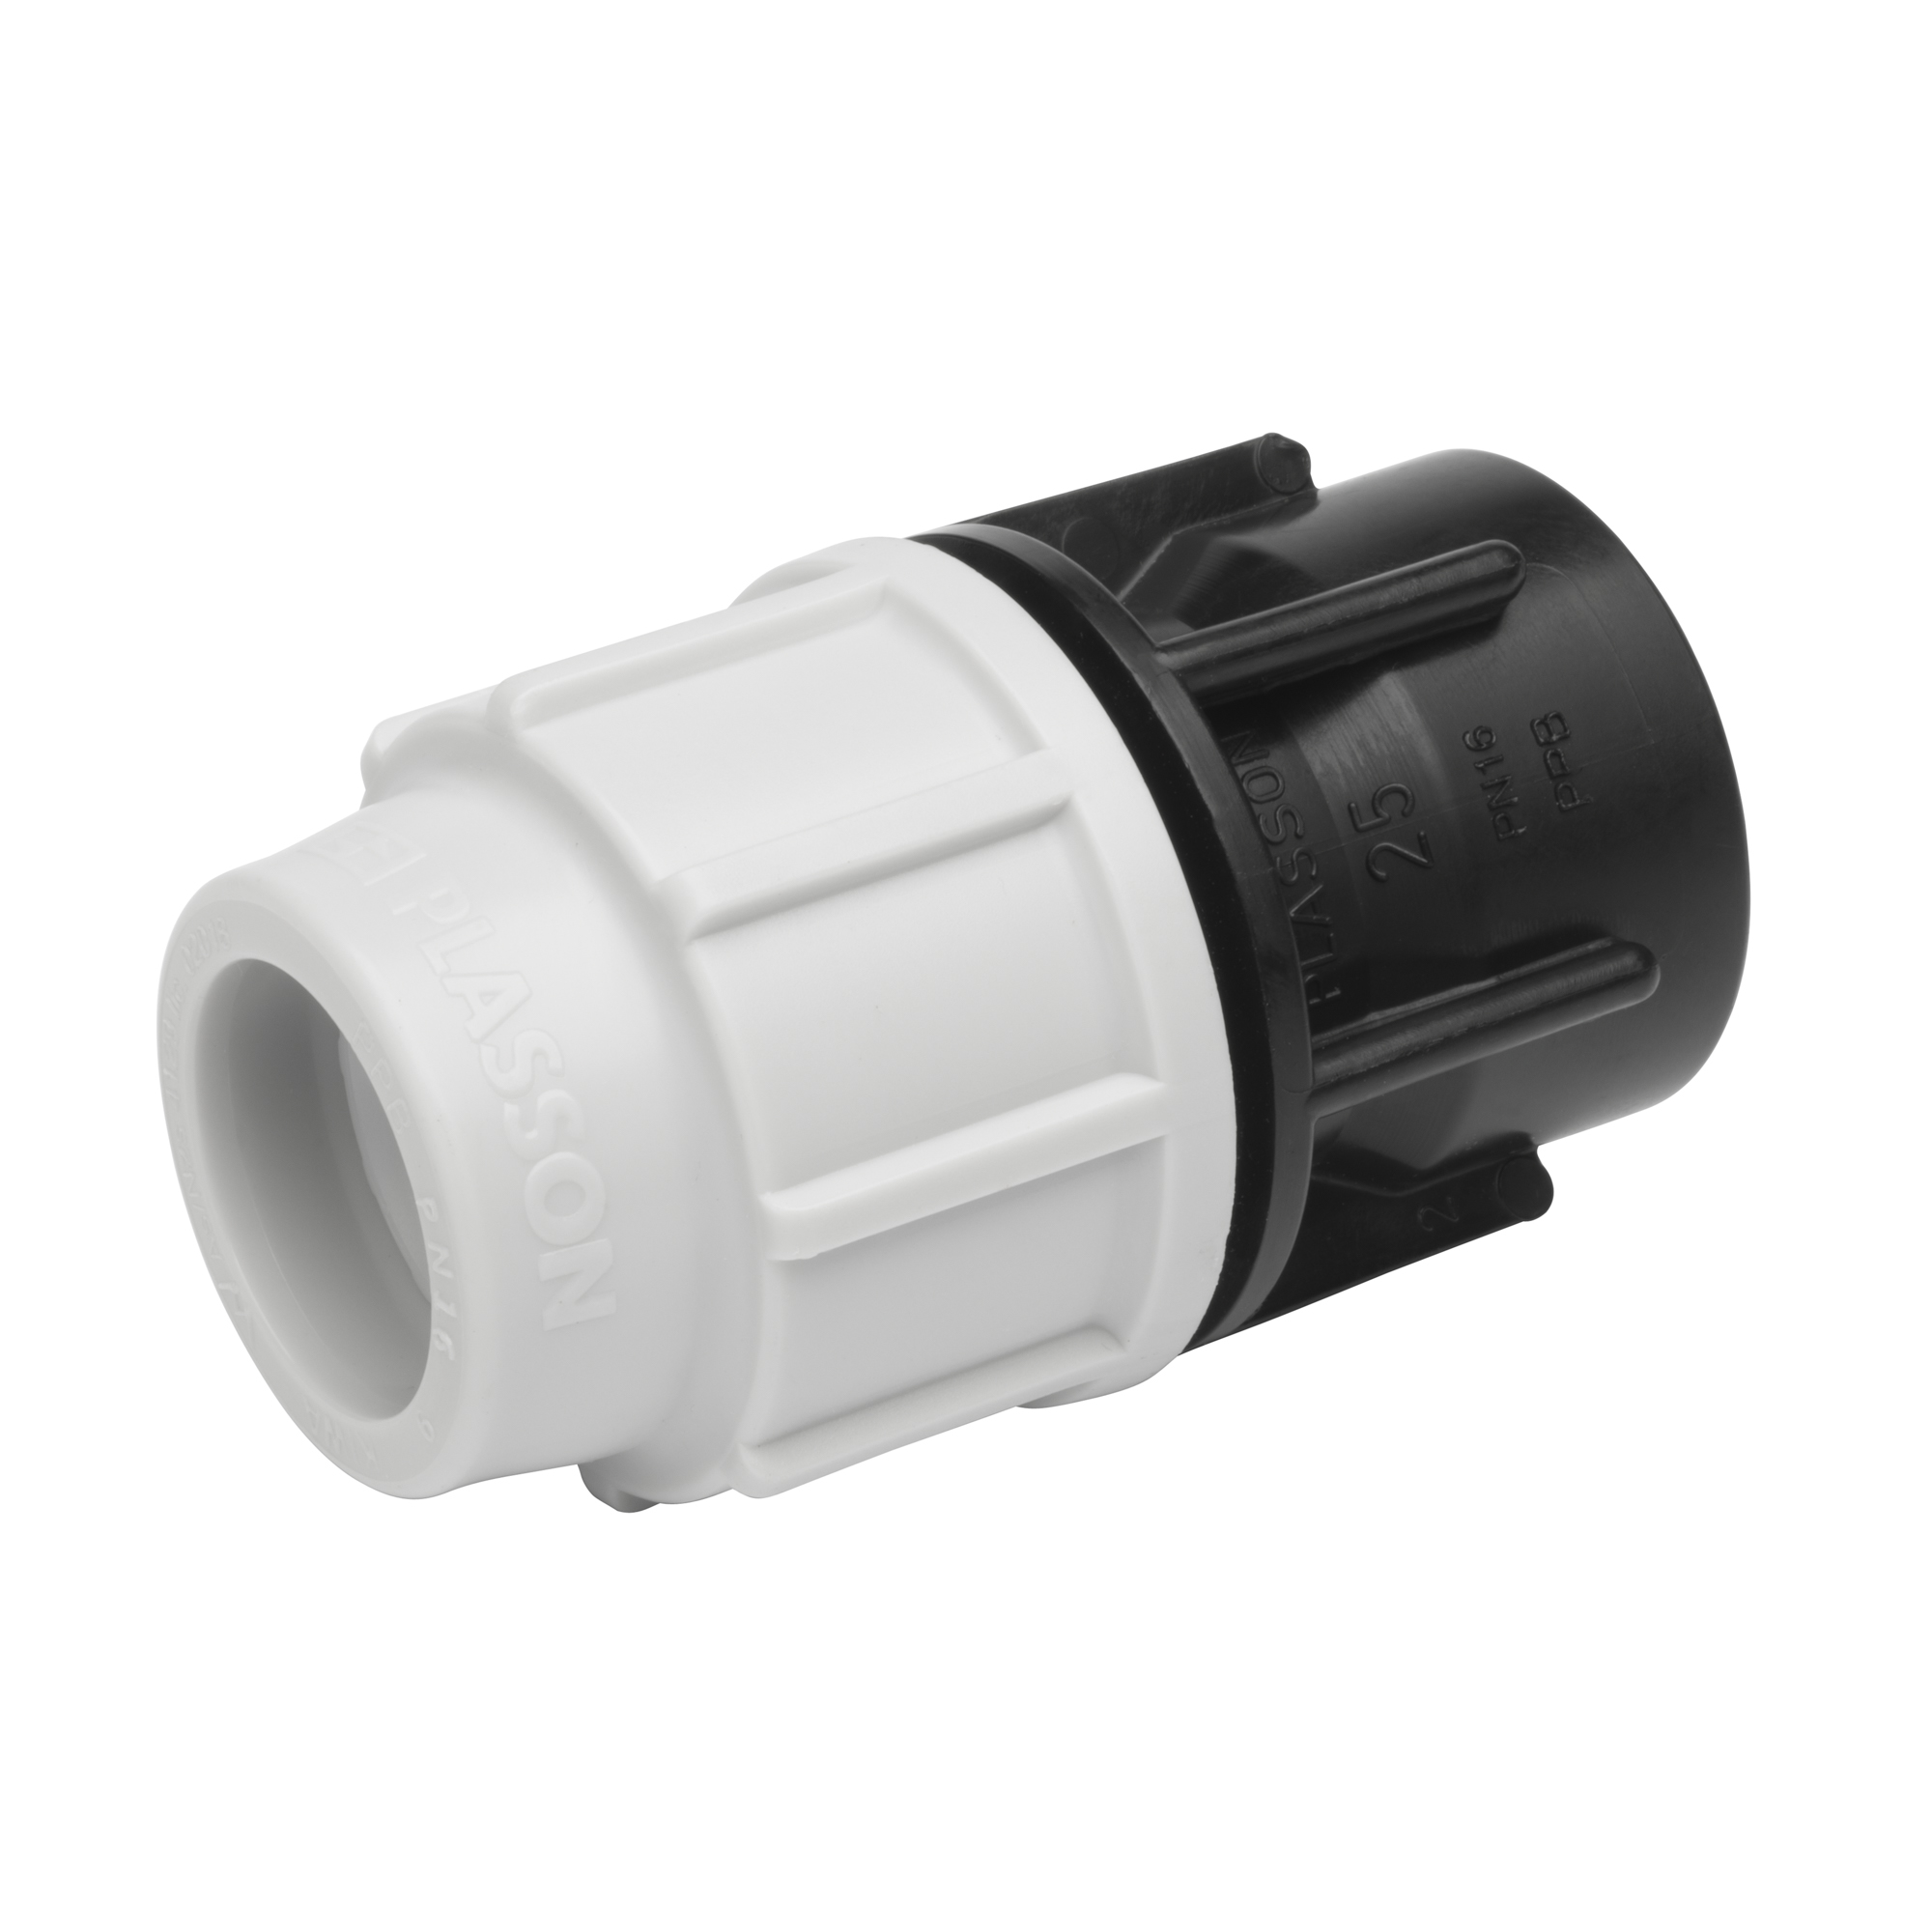 Female adaptor 32mm x 1